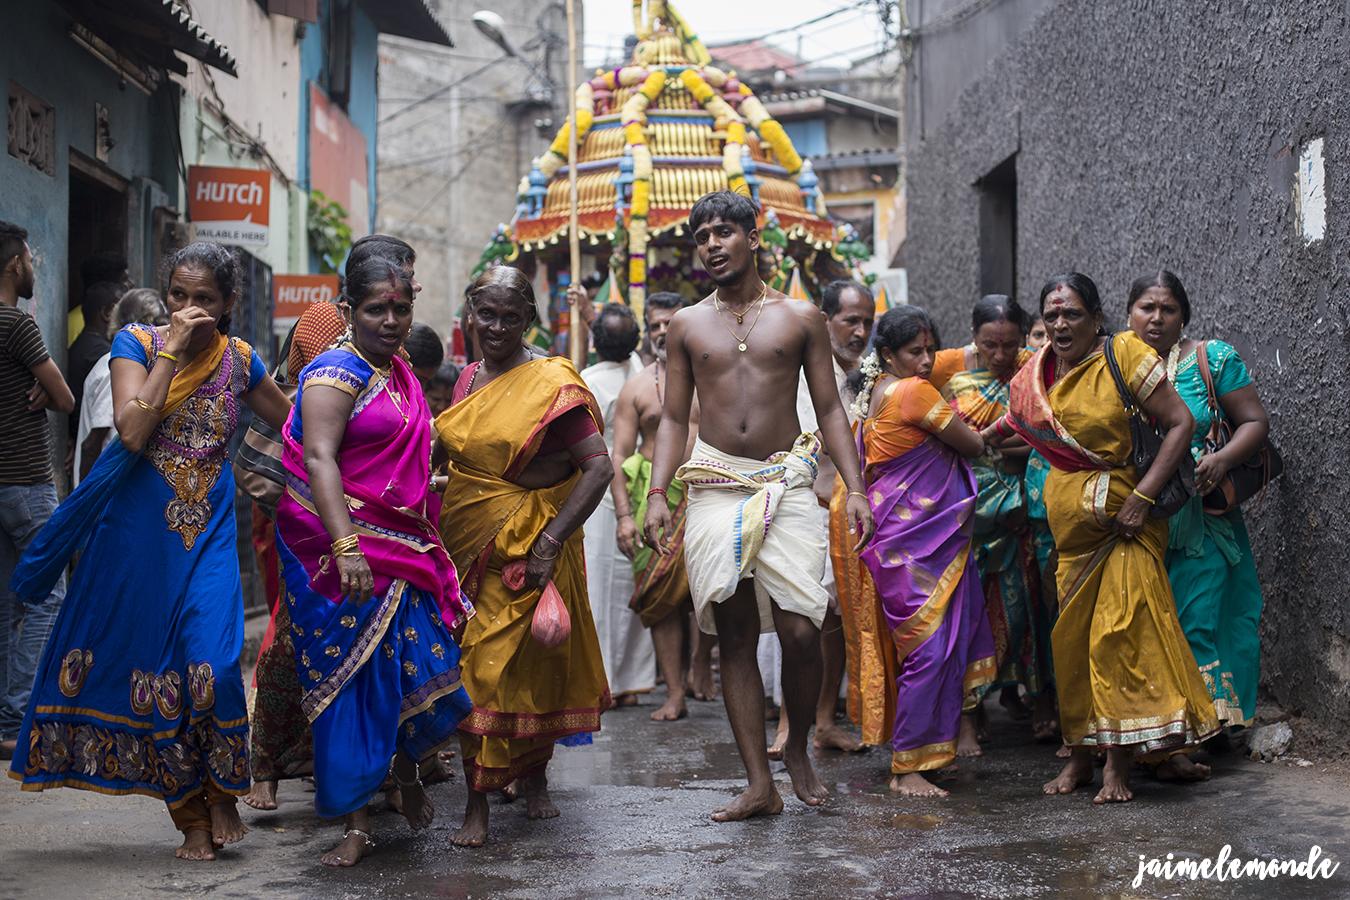 Portraits de voyage au Sri Lanka ©jaimelemonde (1)